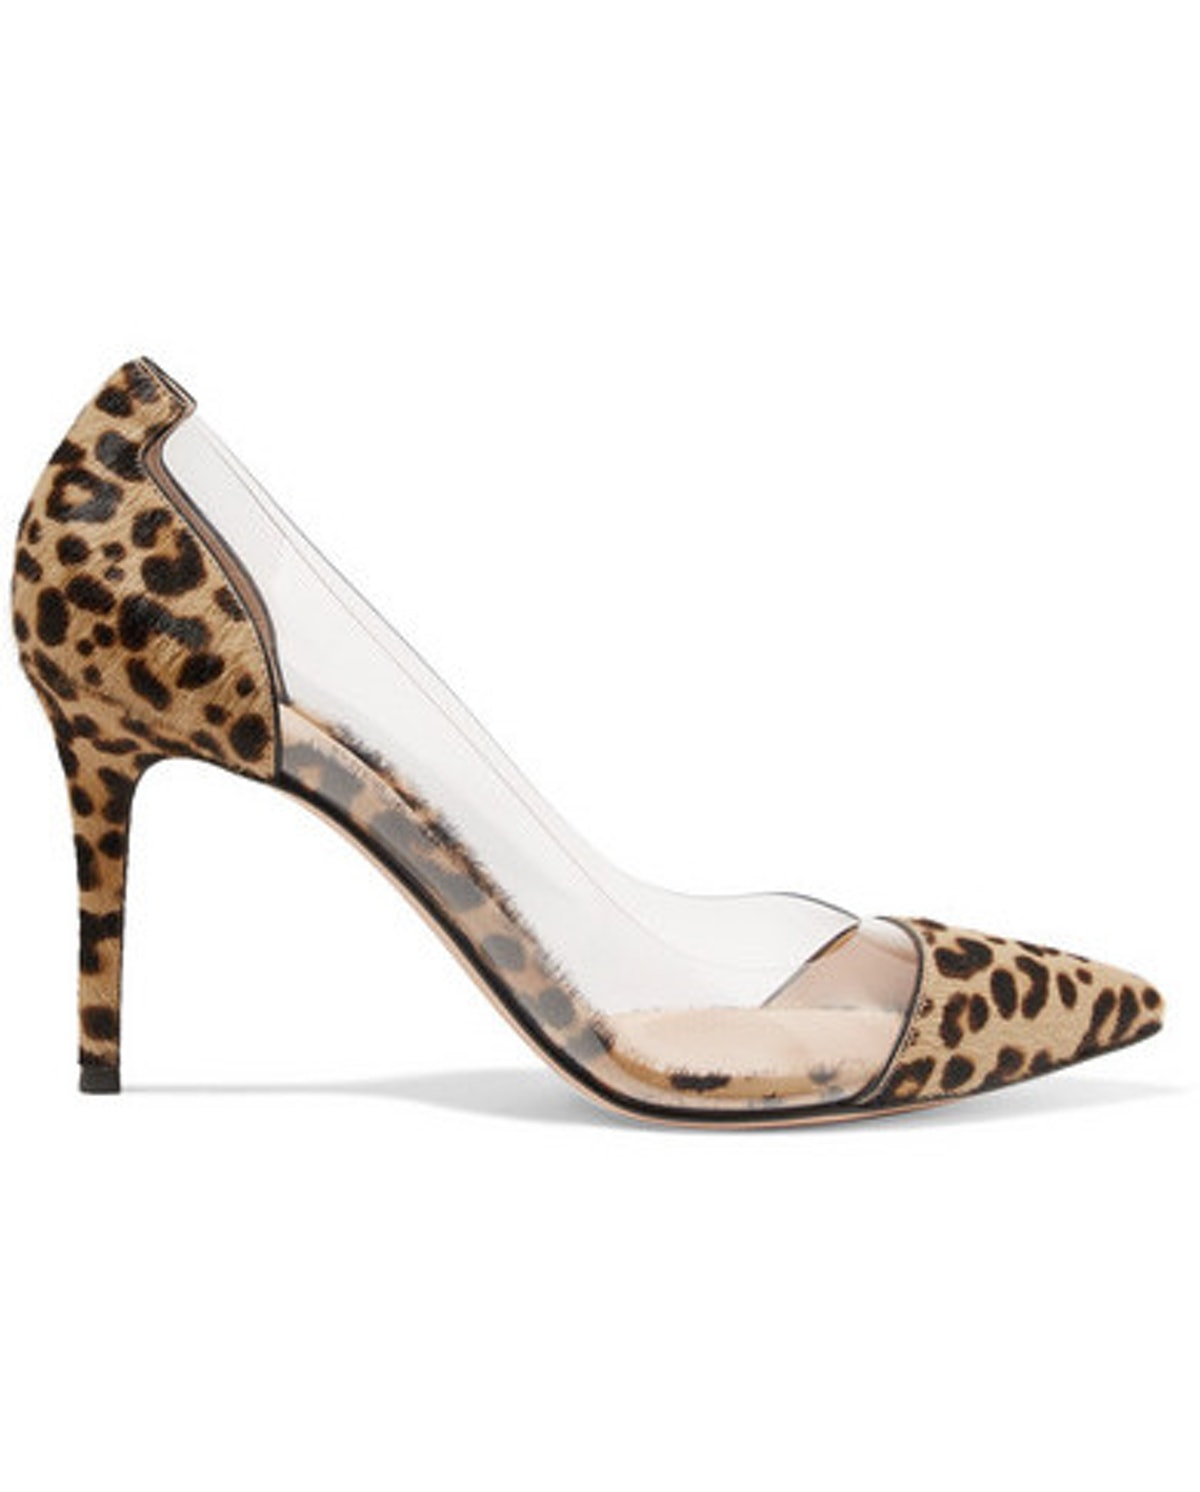 Plexi 85 Leopard-Print Calf Hair And PVC Pumps